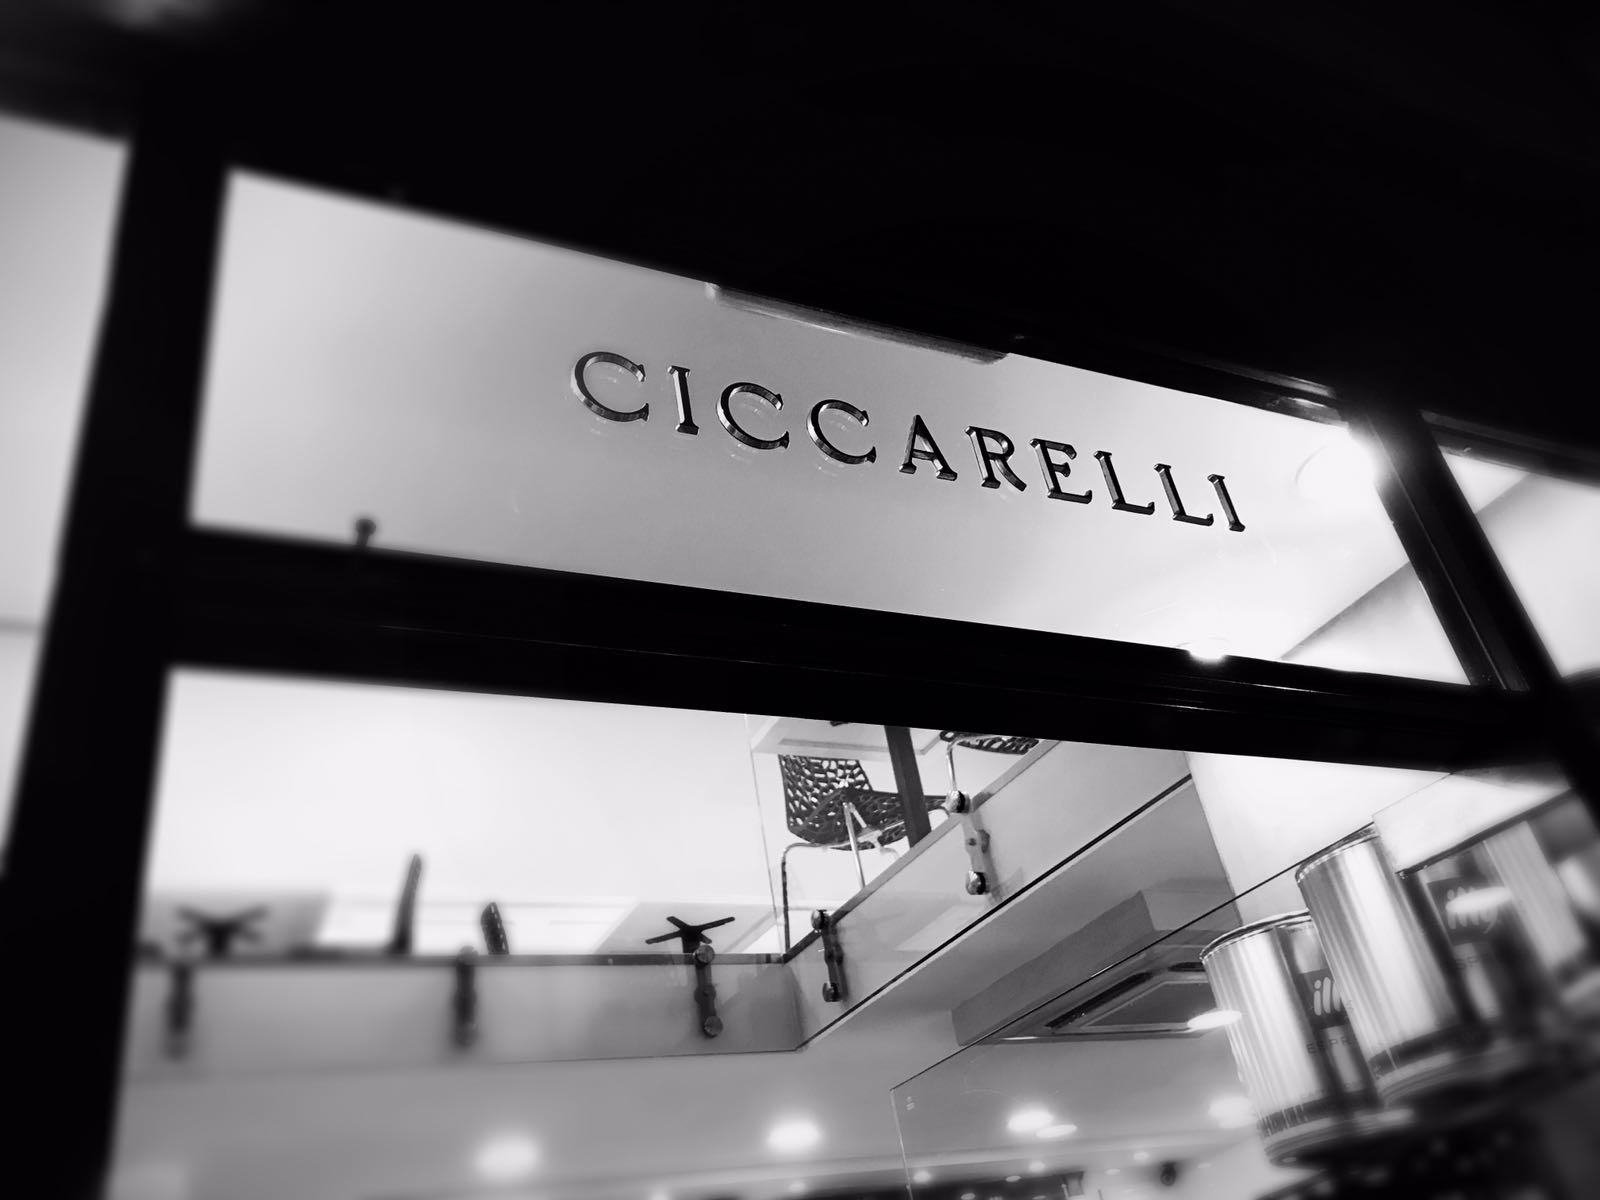 LOGO CAFFETTERIA CICCARELLI